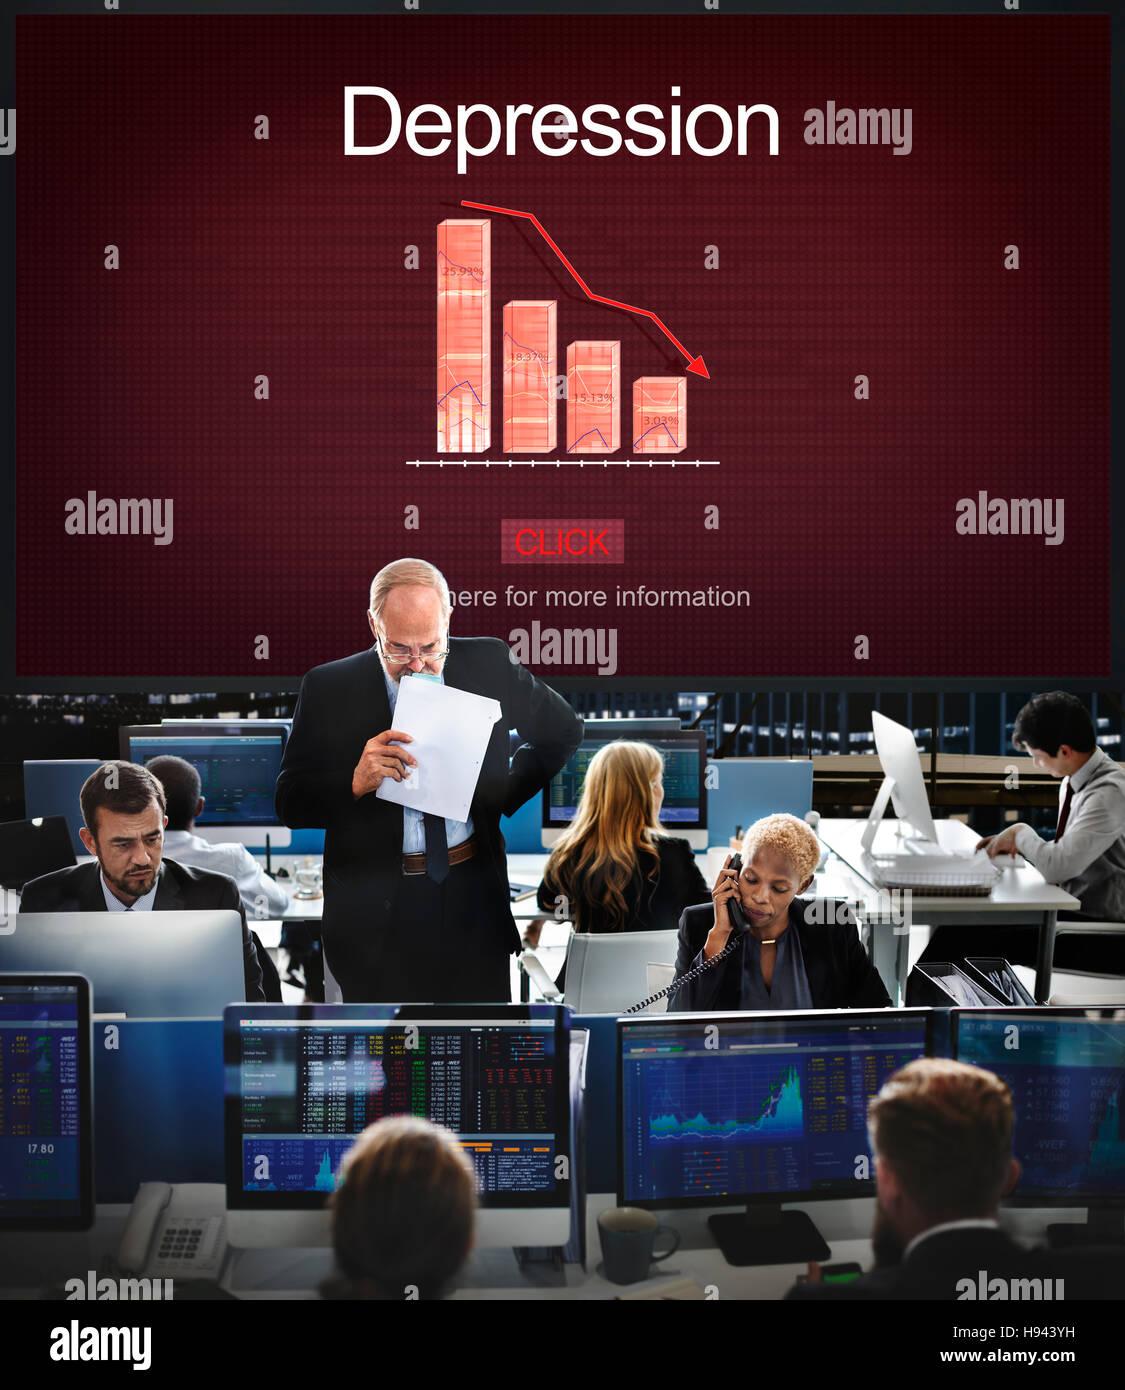 Depression Disorder Downturn Illness Medicine Concept - Stock Image